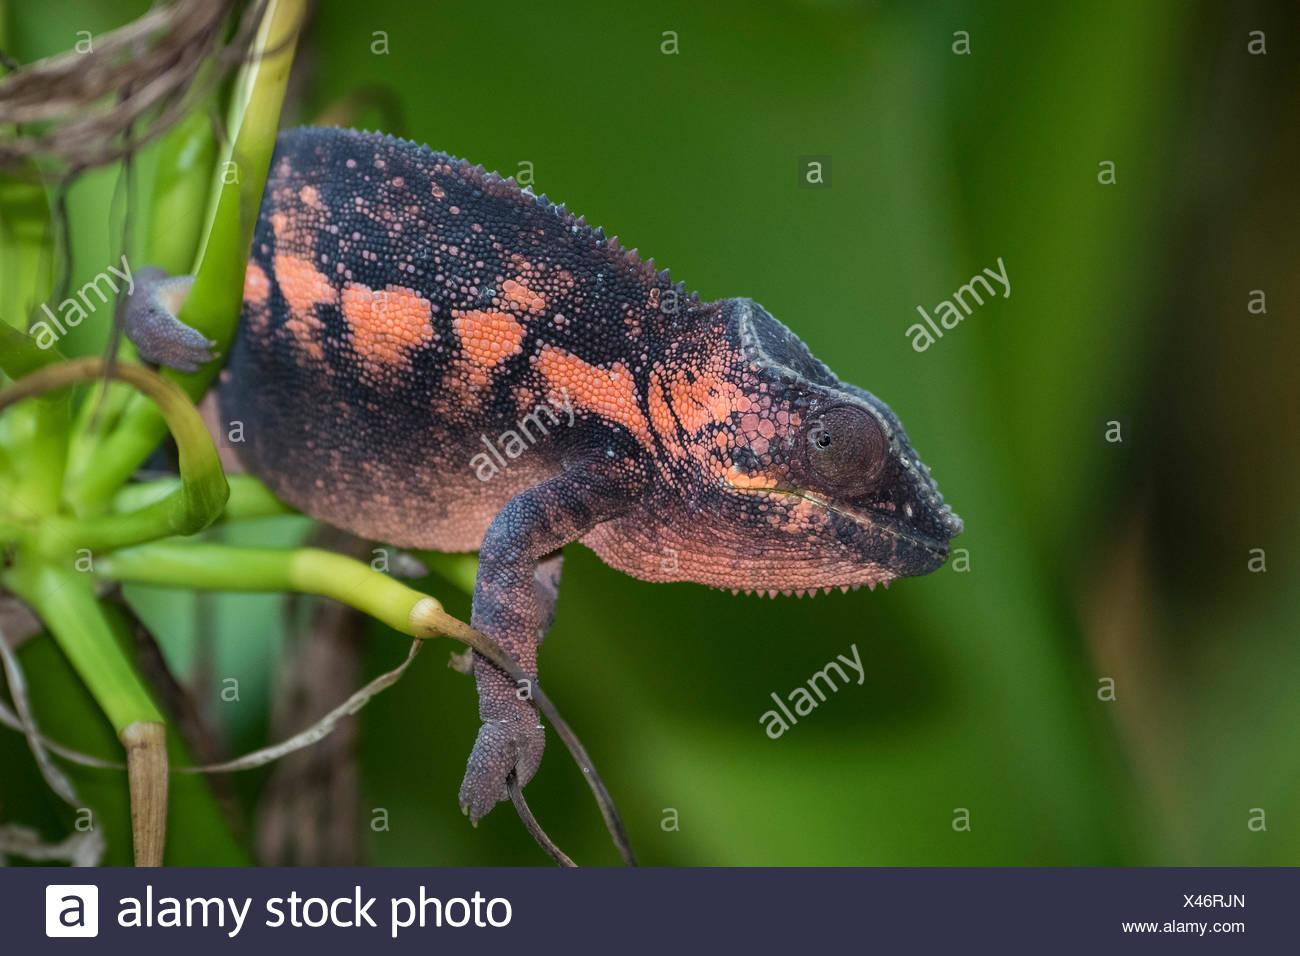 Panther Chameleon (Furcifer pardalis), femmina, captive, nativo del Madagascar Immagini Stock